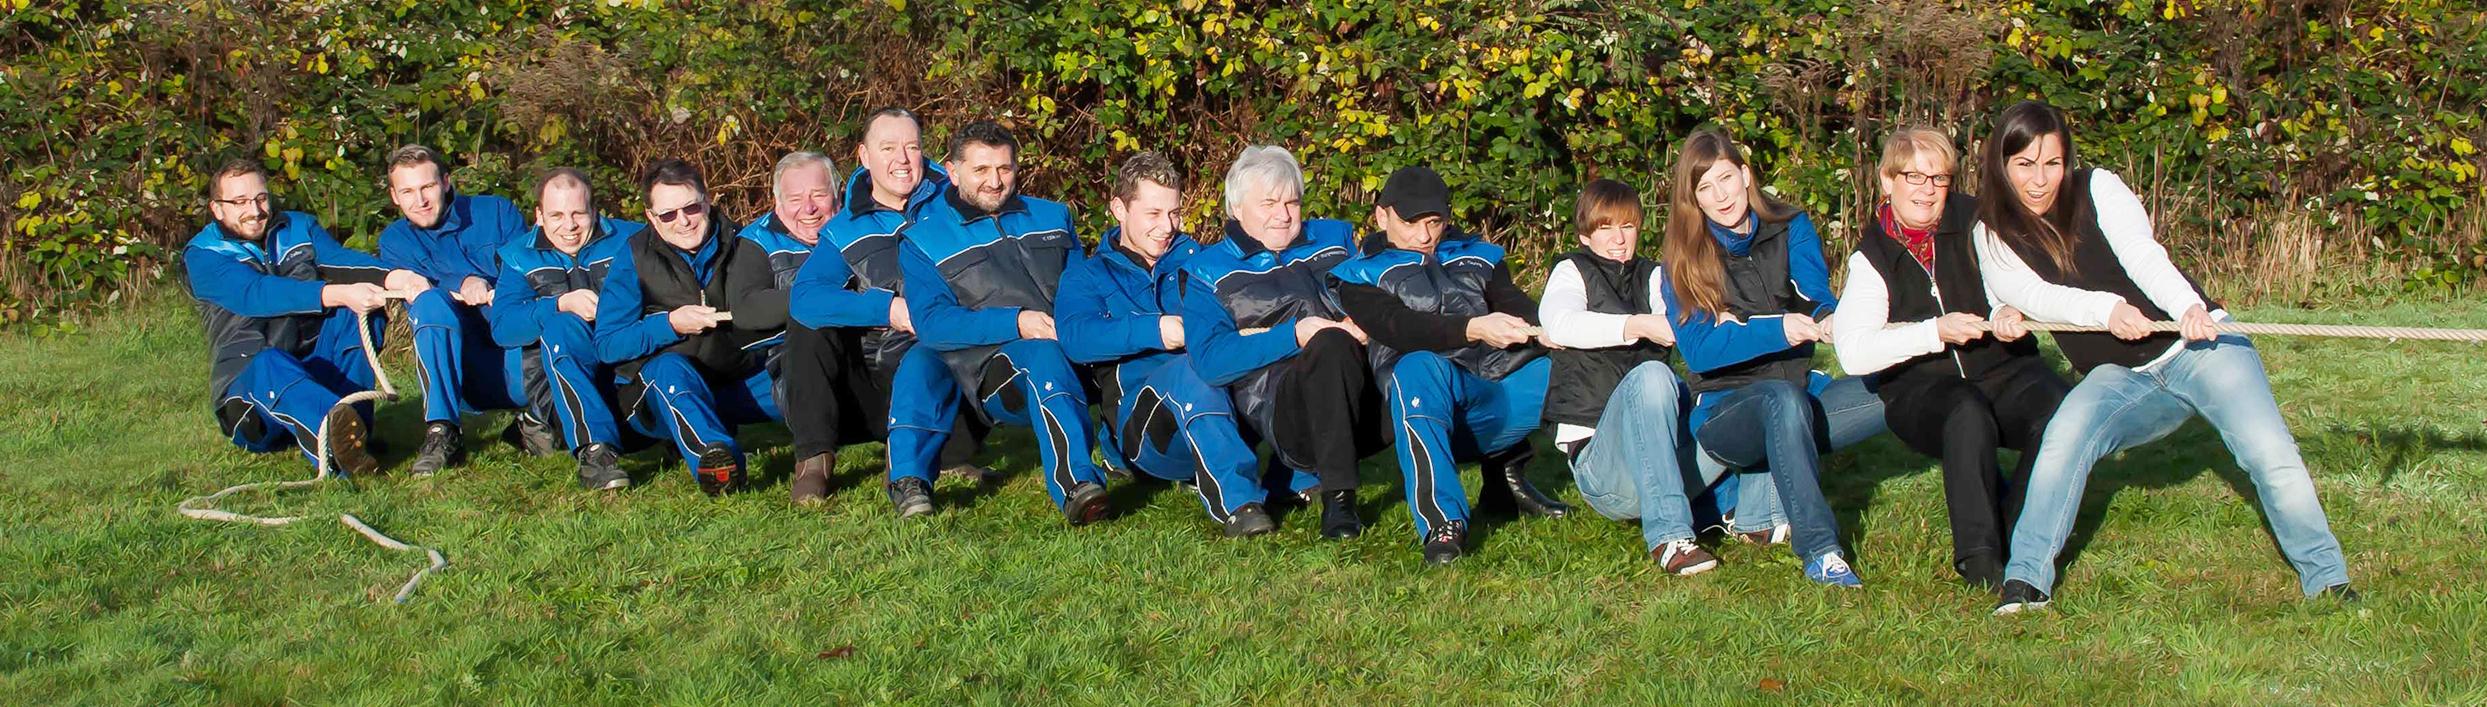 PSL Team